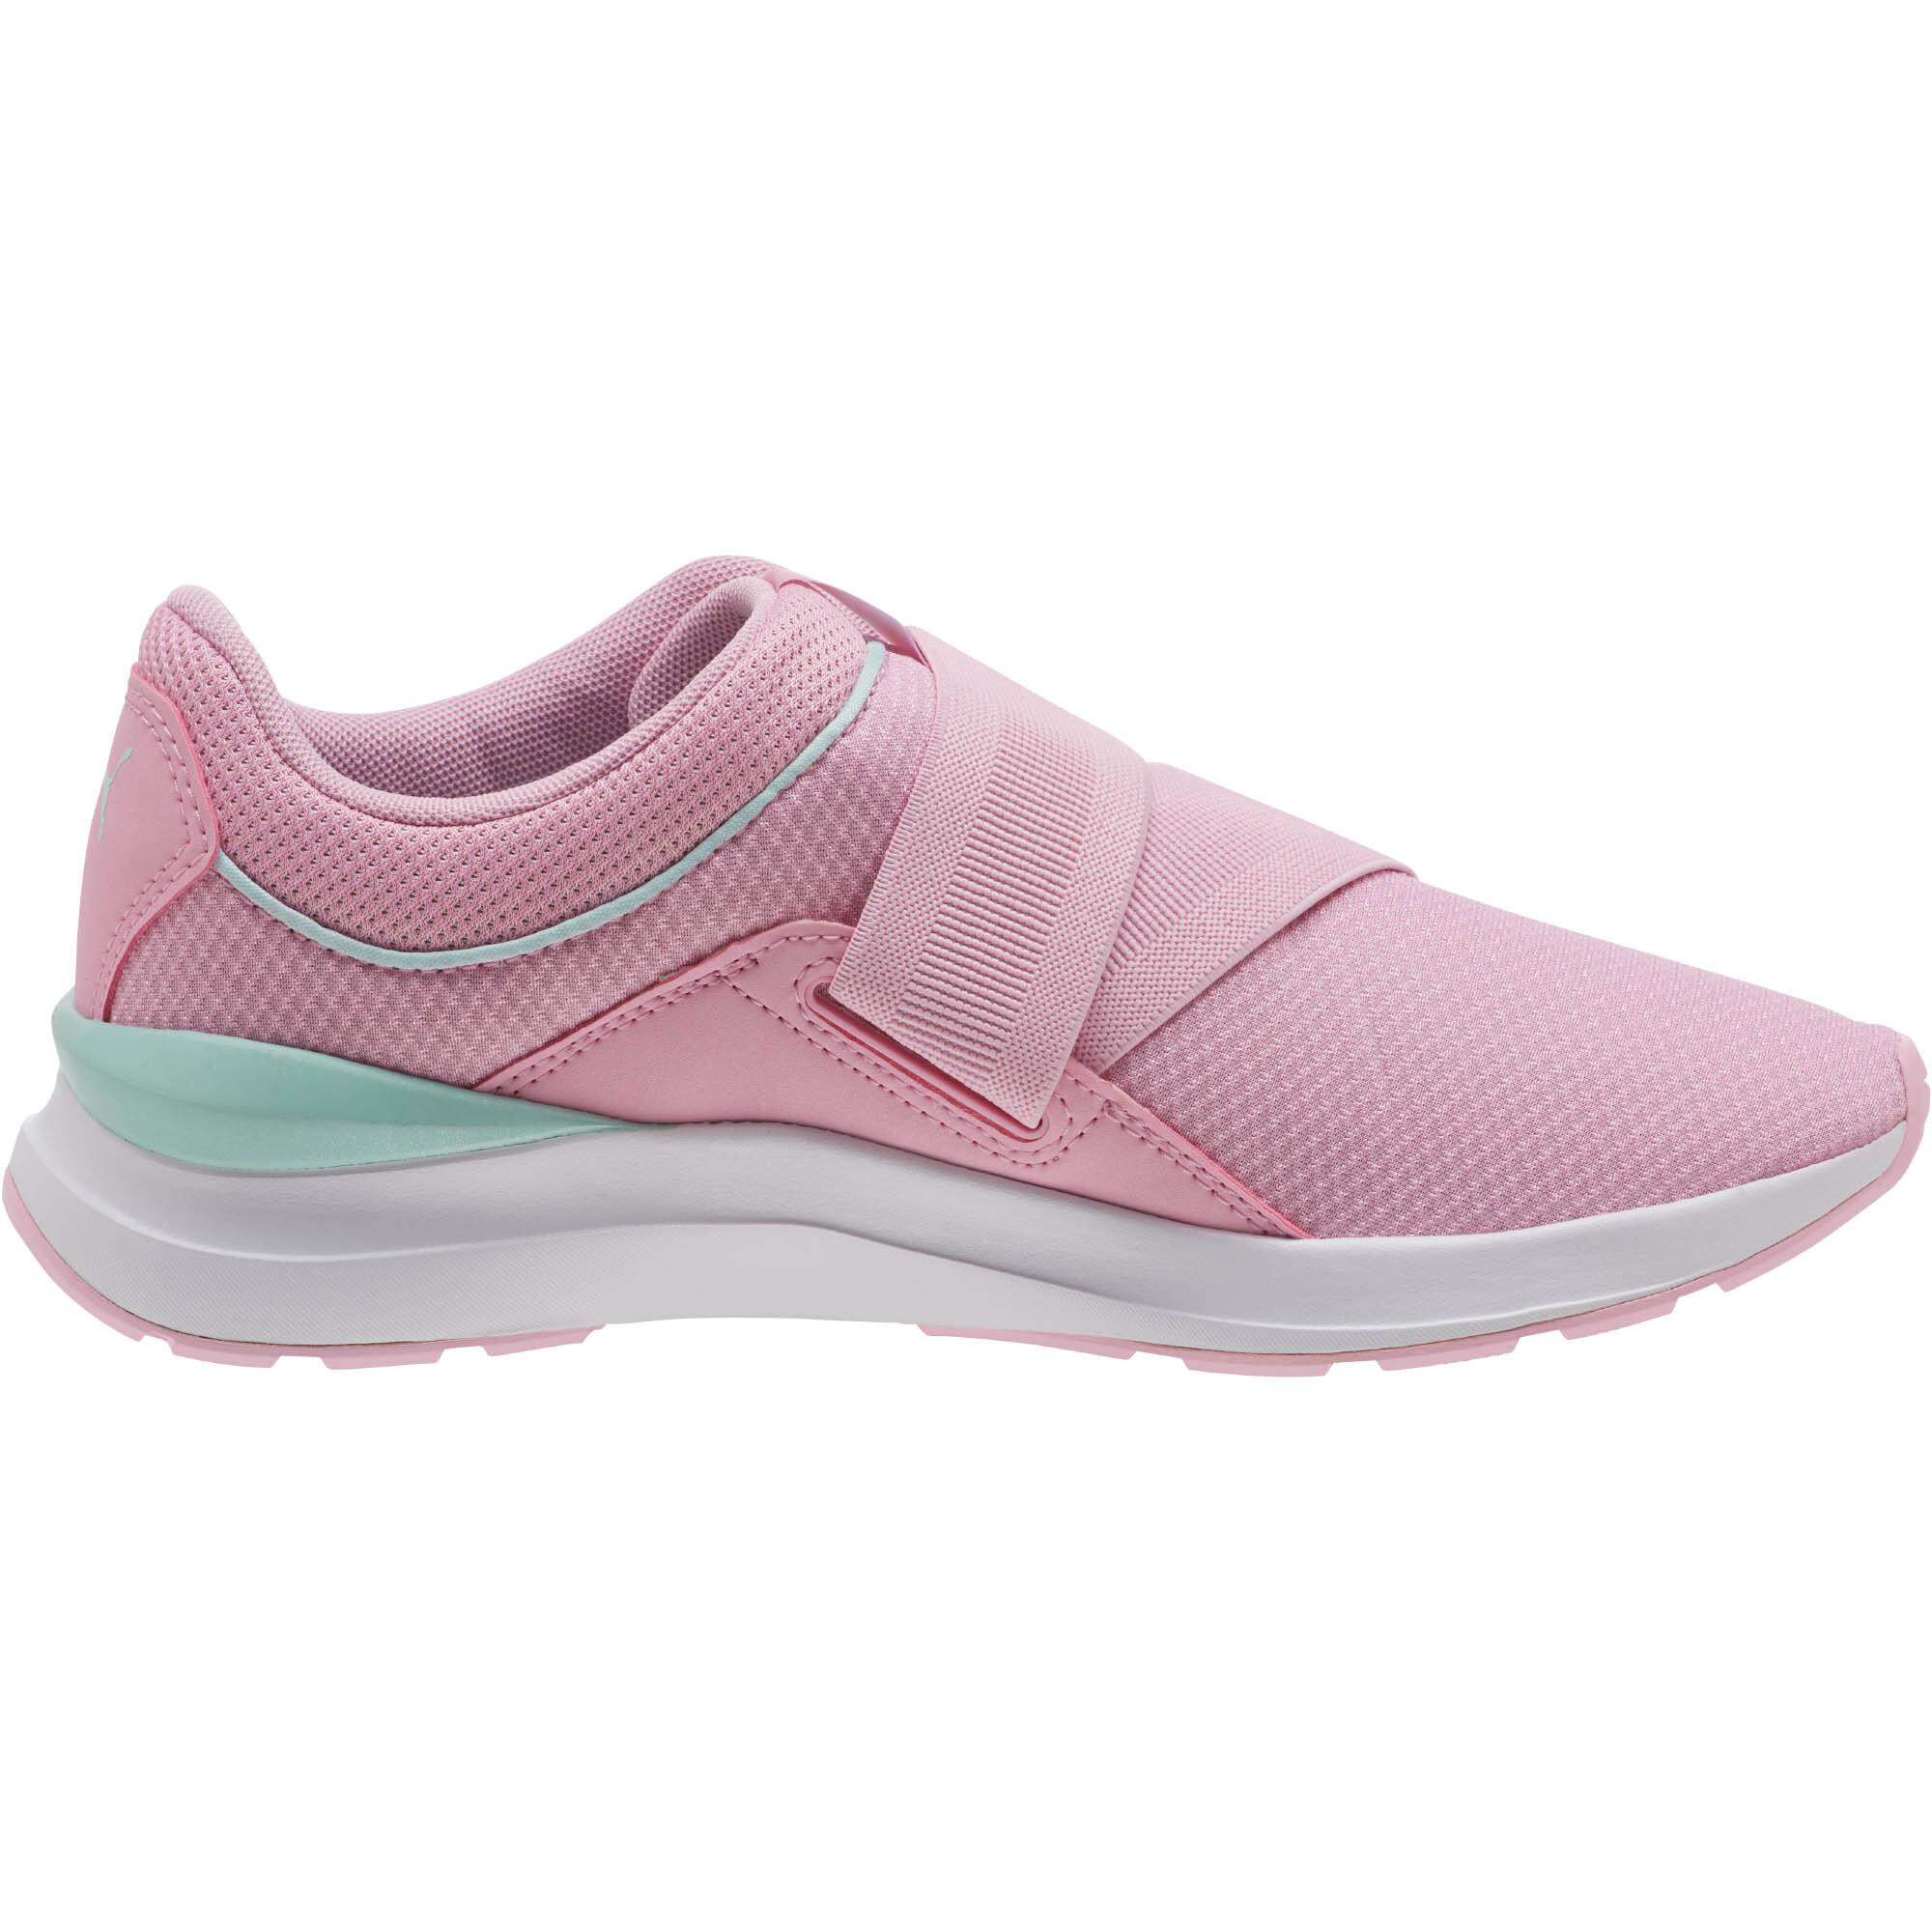 PUMA-Adela-X-Women-s-Sneakers-Women-Shoe-Basics thumbnail 5